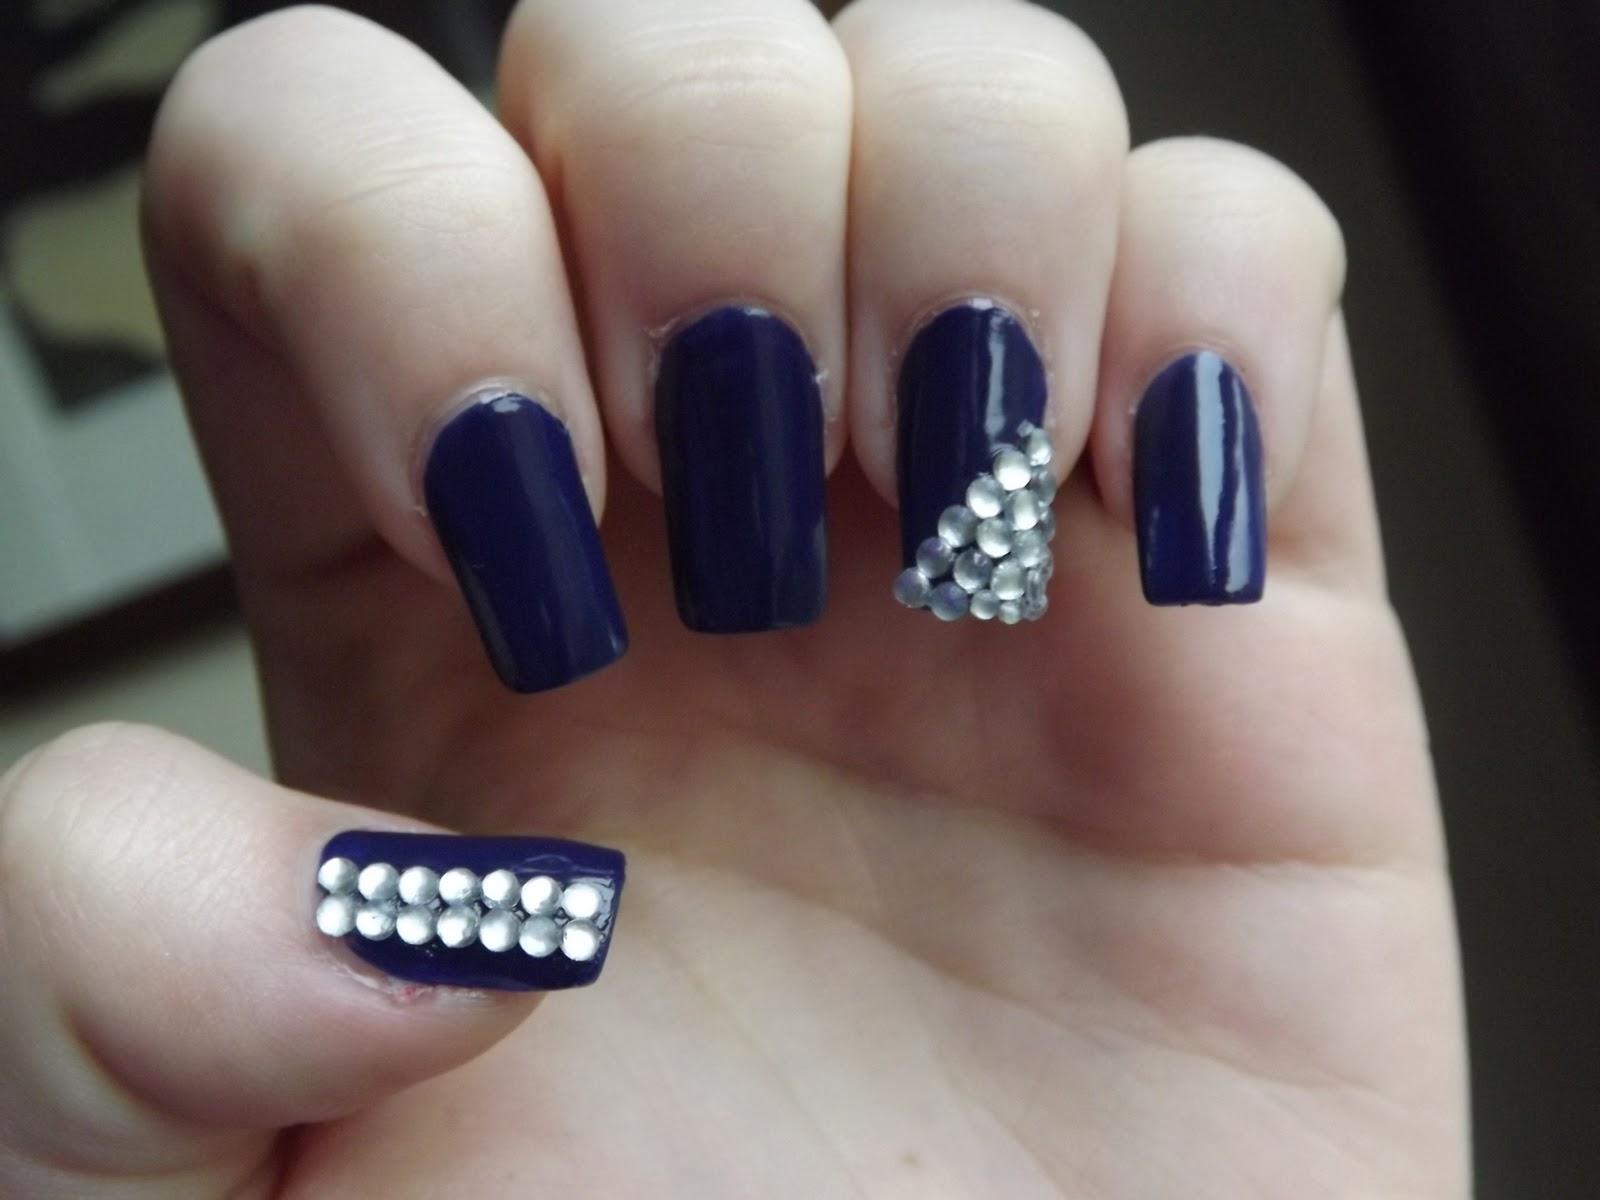 Beauty Junkies Opinions: Bling nail art.